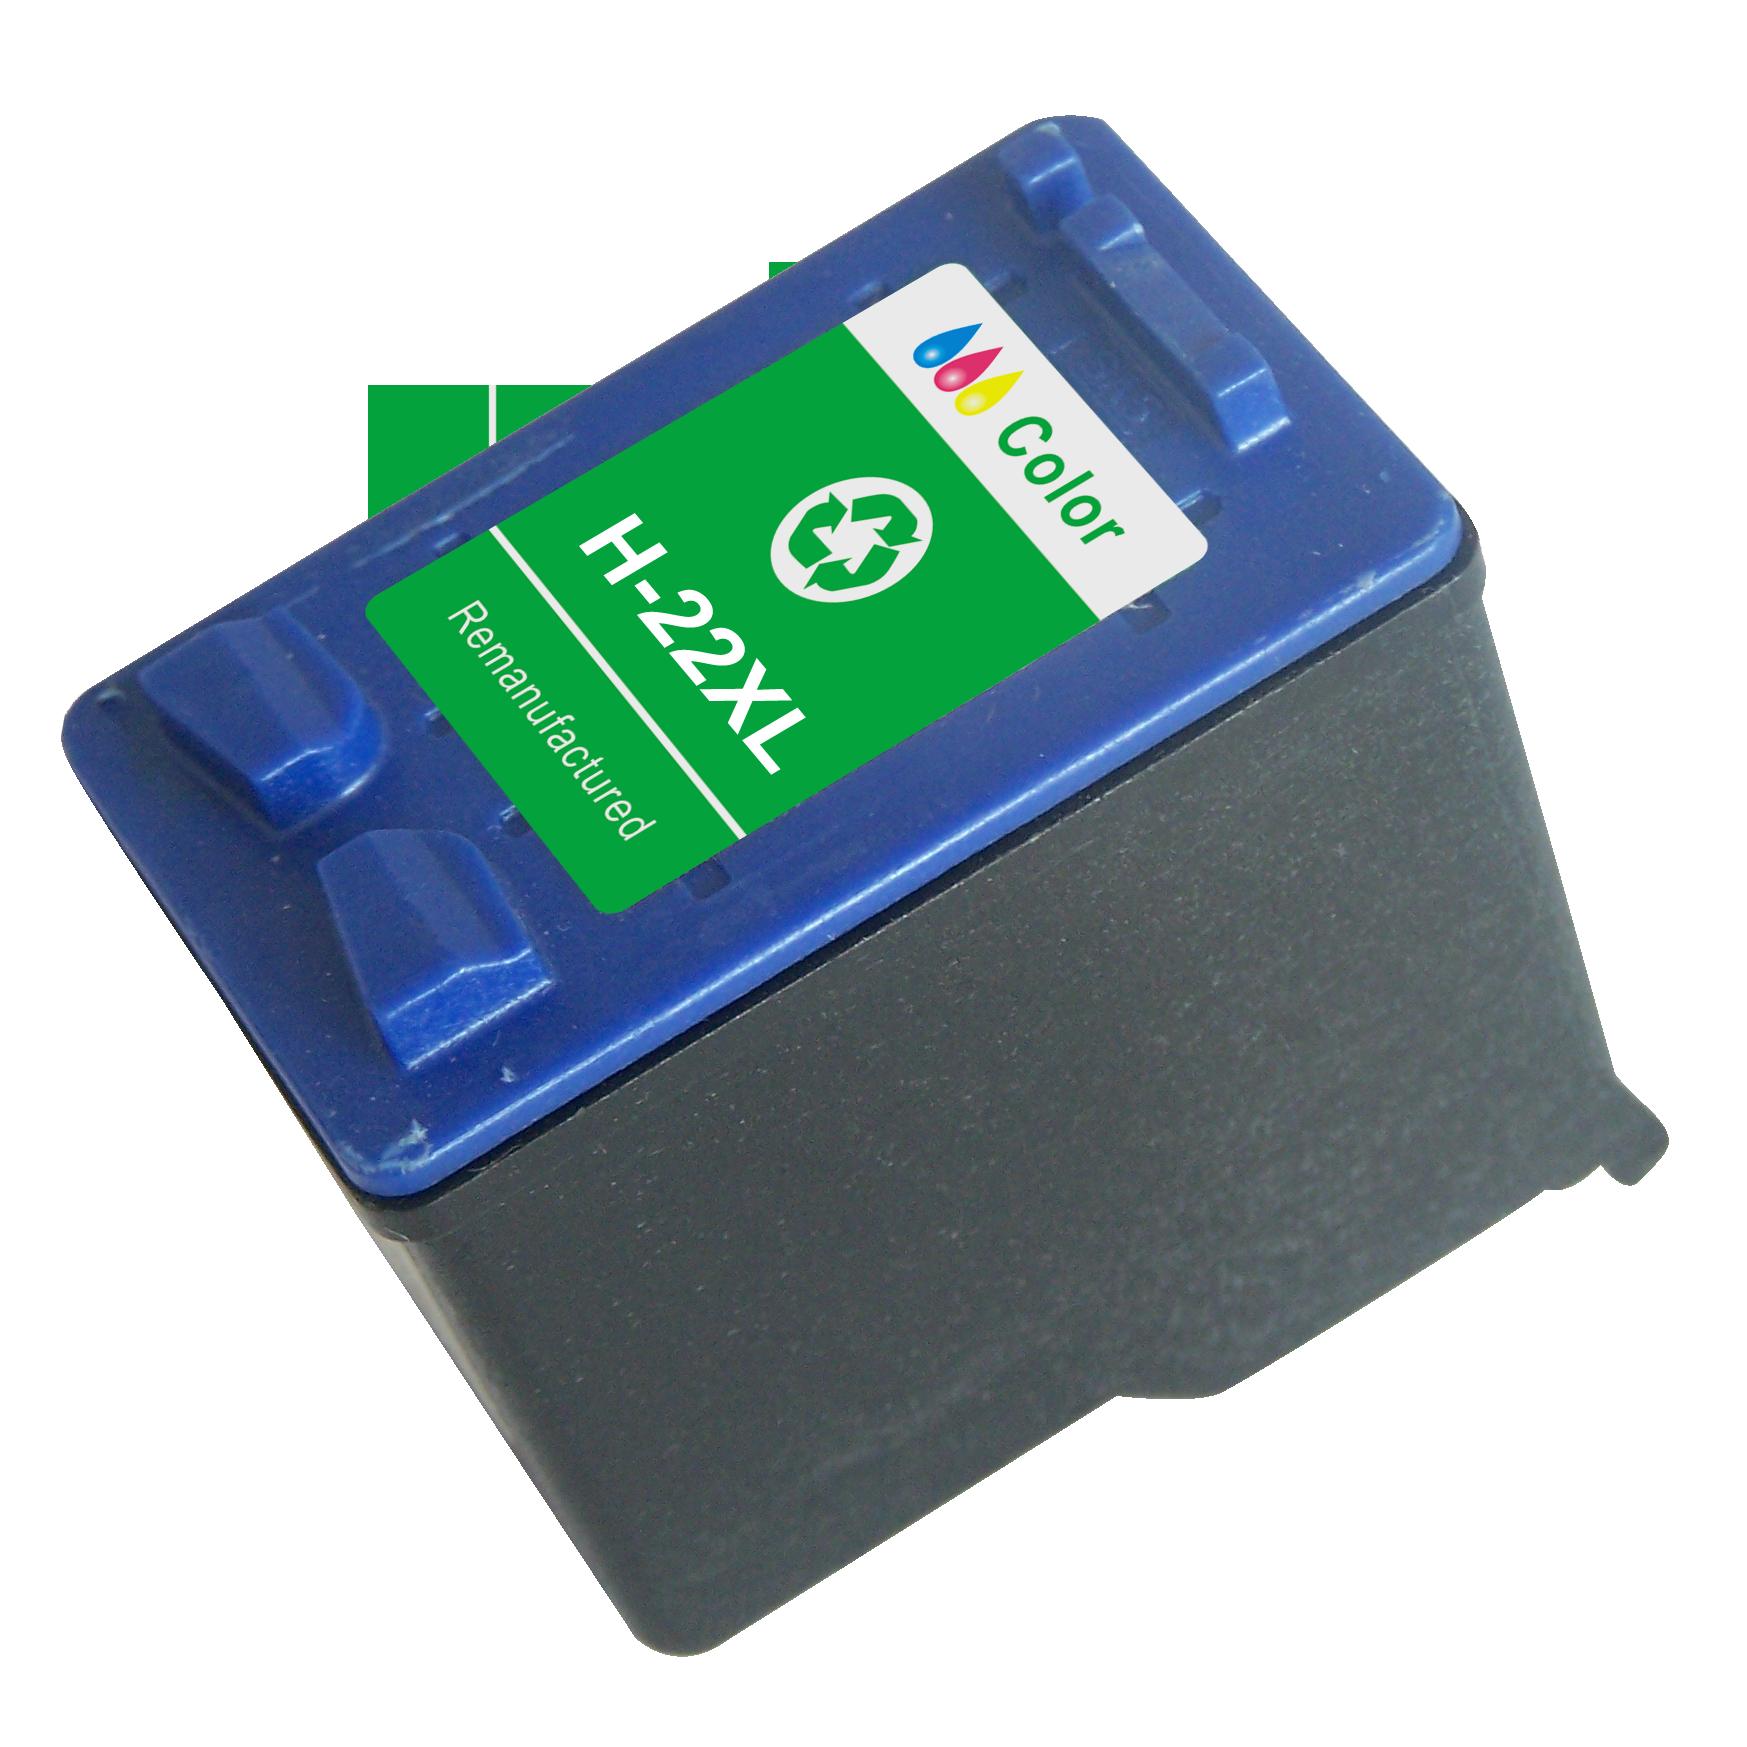 Reman Hewlett Packard C9352AE Inkjet